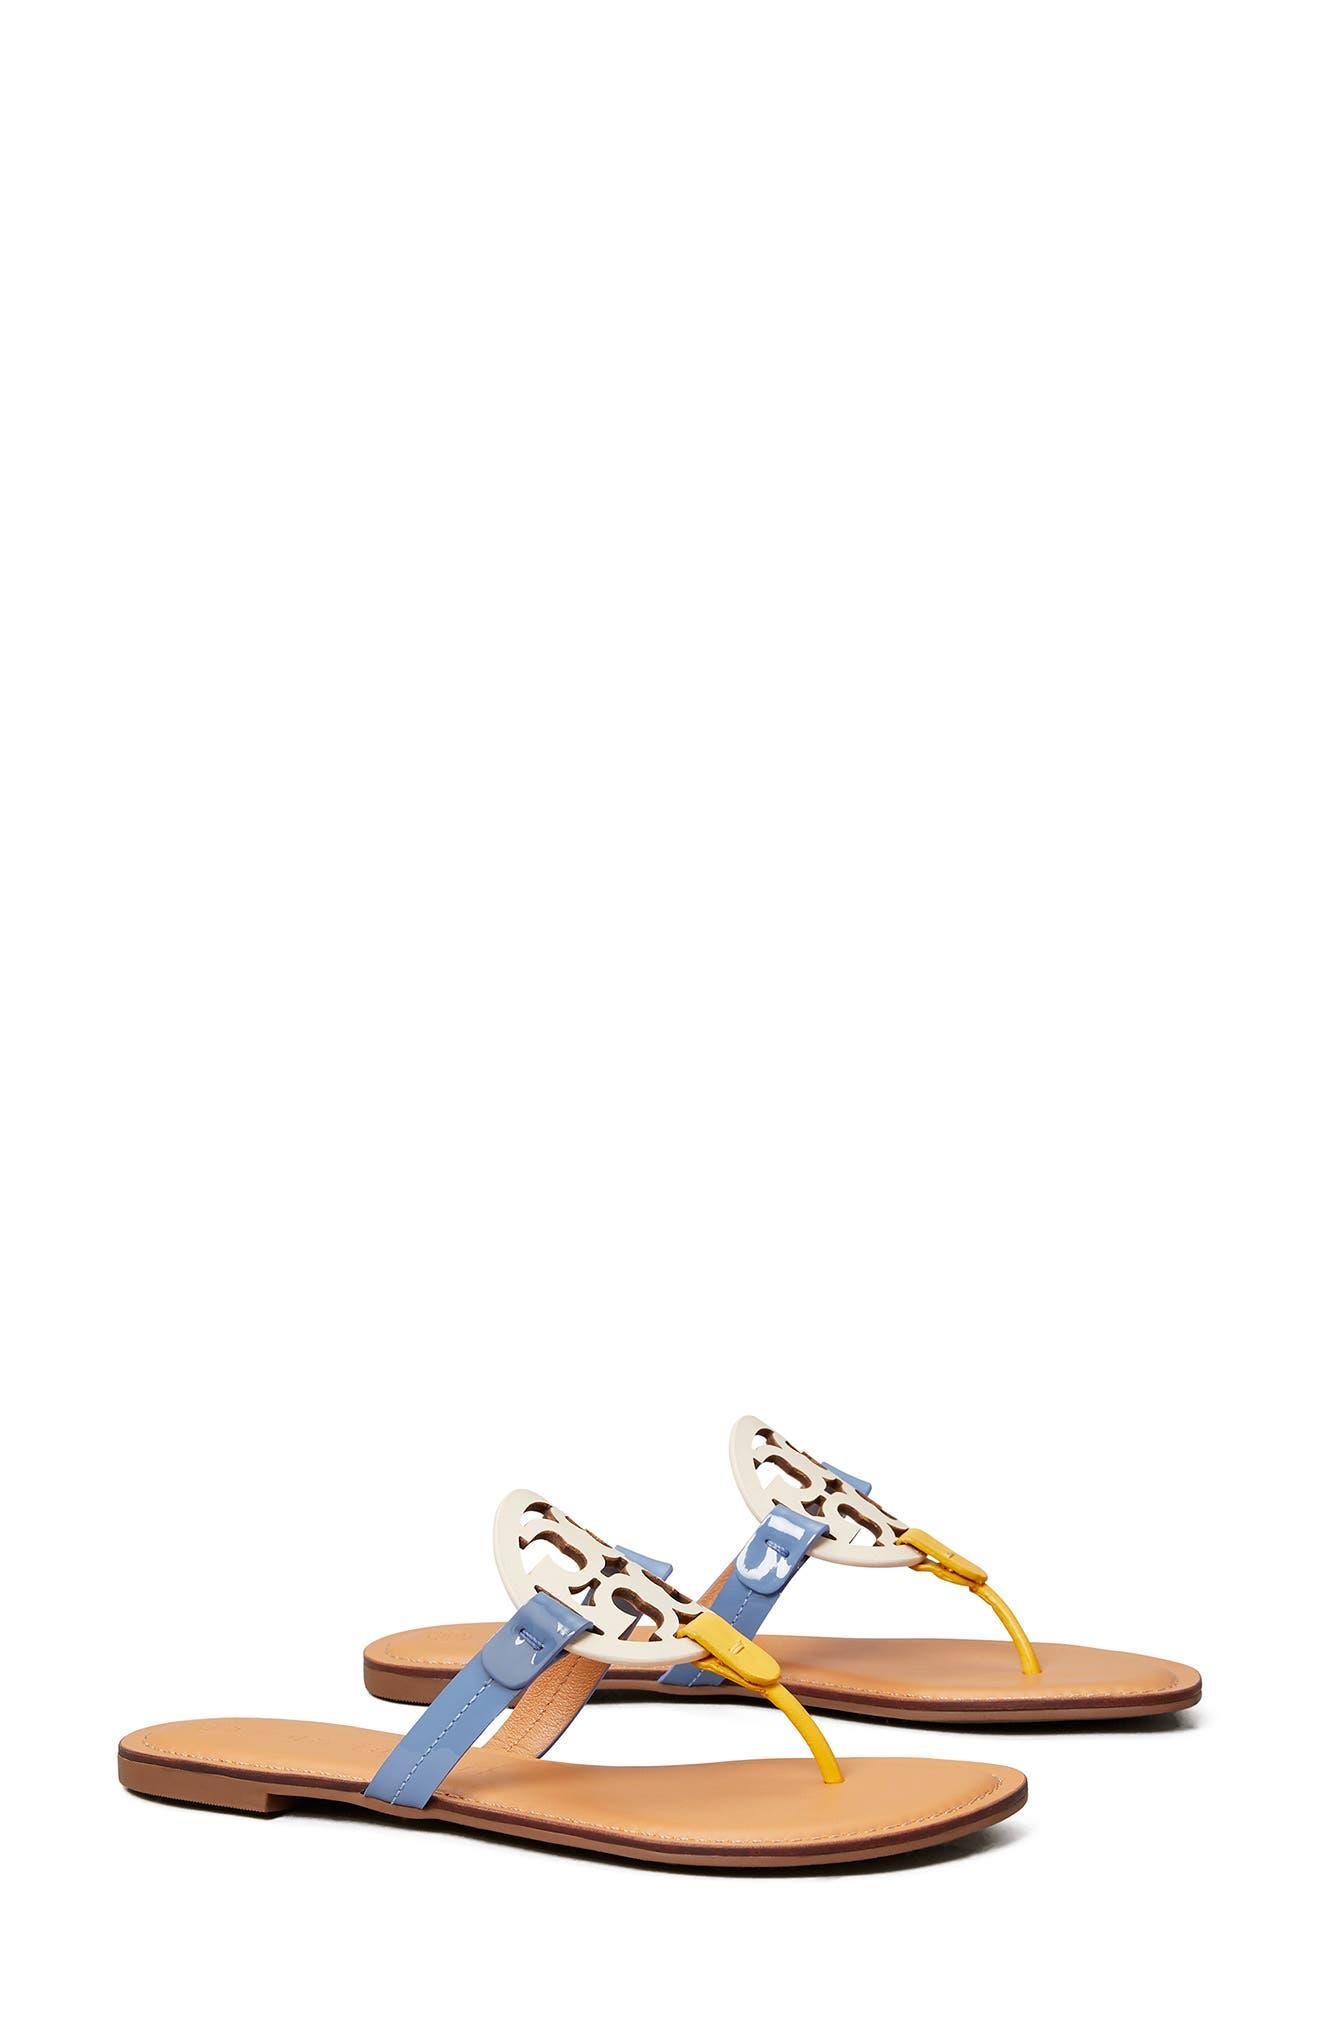 Women's Ivory Sandals and Flip-Flops